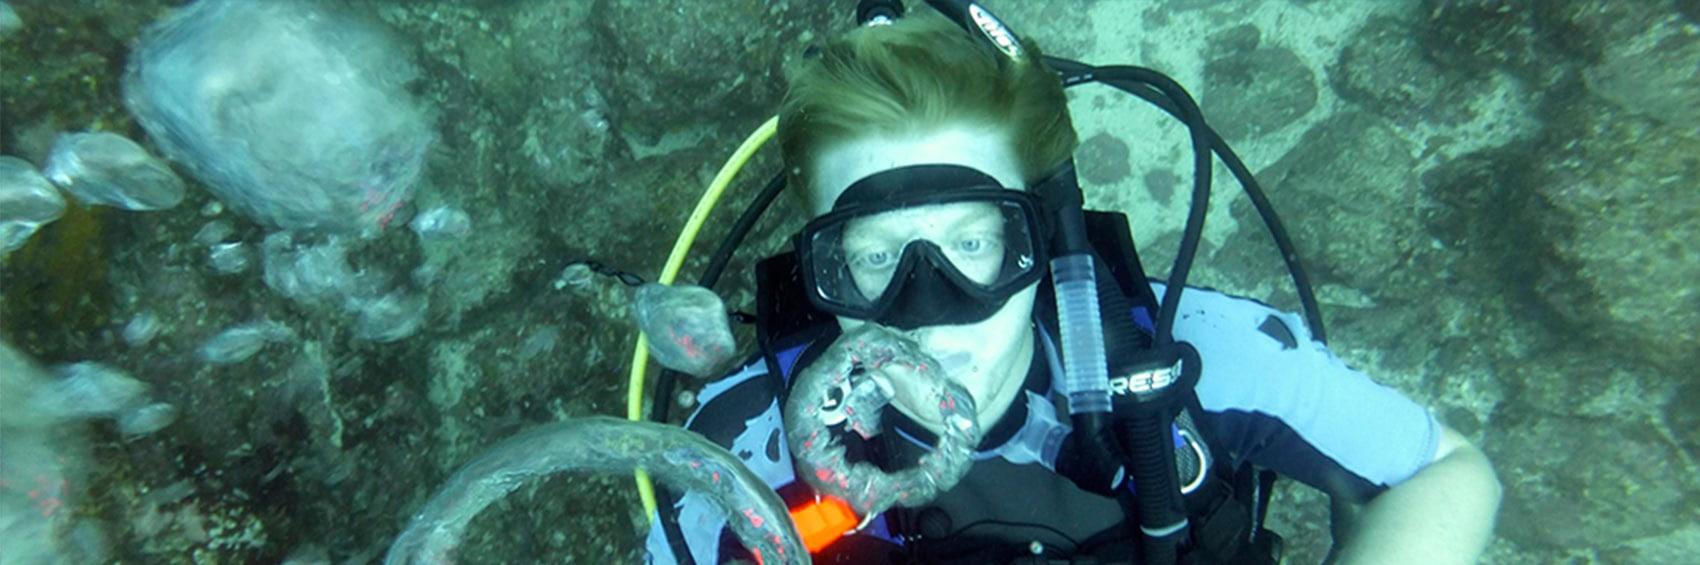 Fun underwater scuba diving